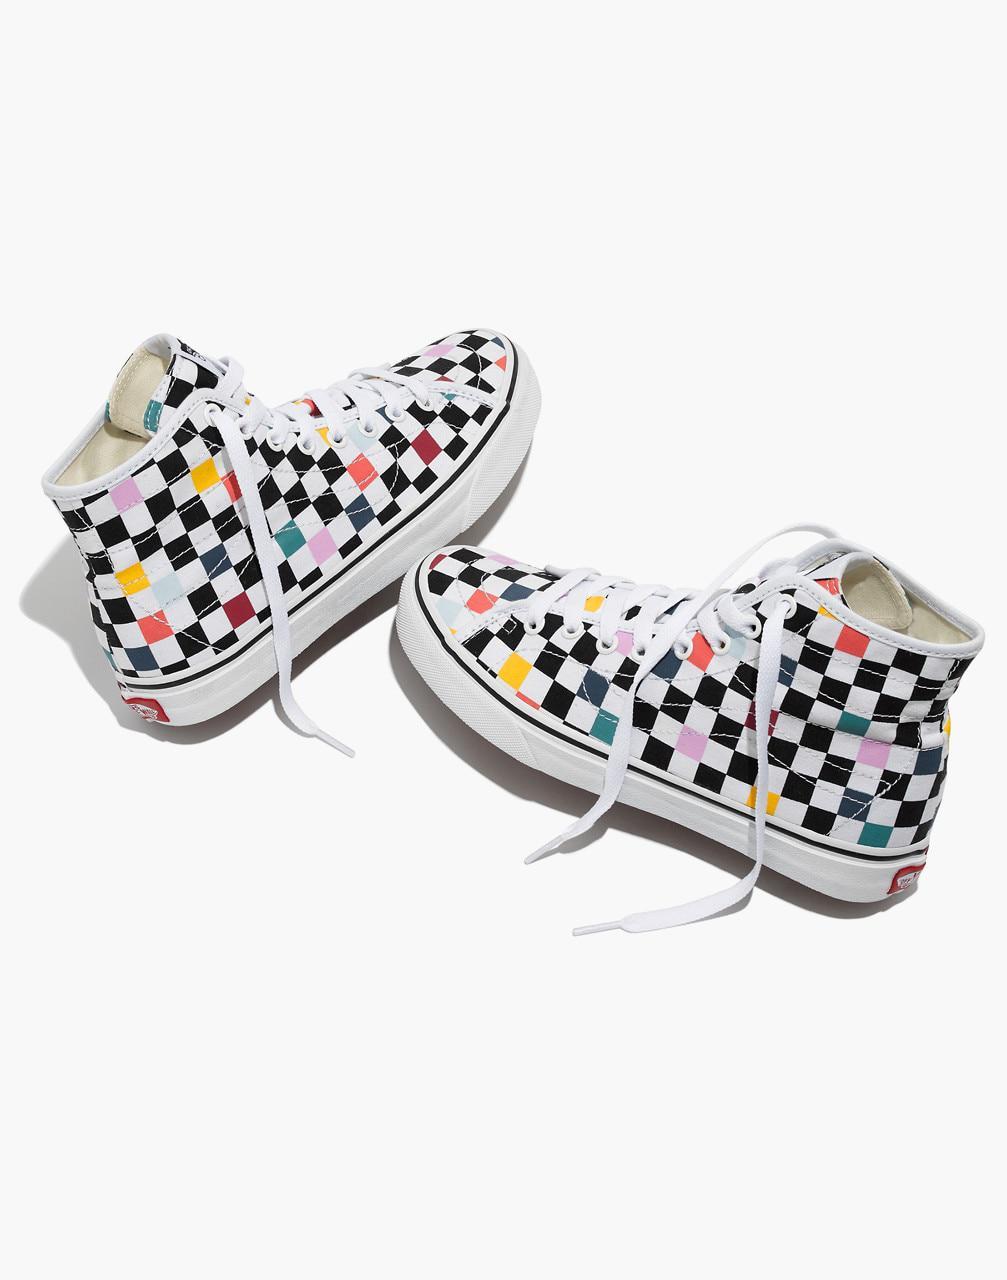 54362b26cc Madewell Vans Unisex Sk8-hi Decon High-top Sneakers In Party ...